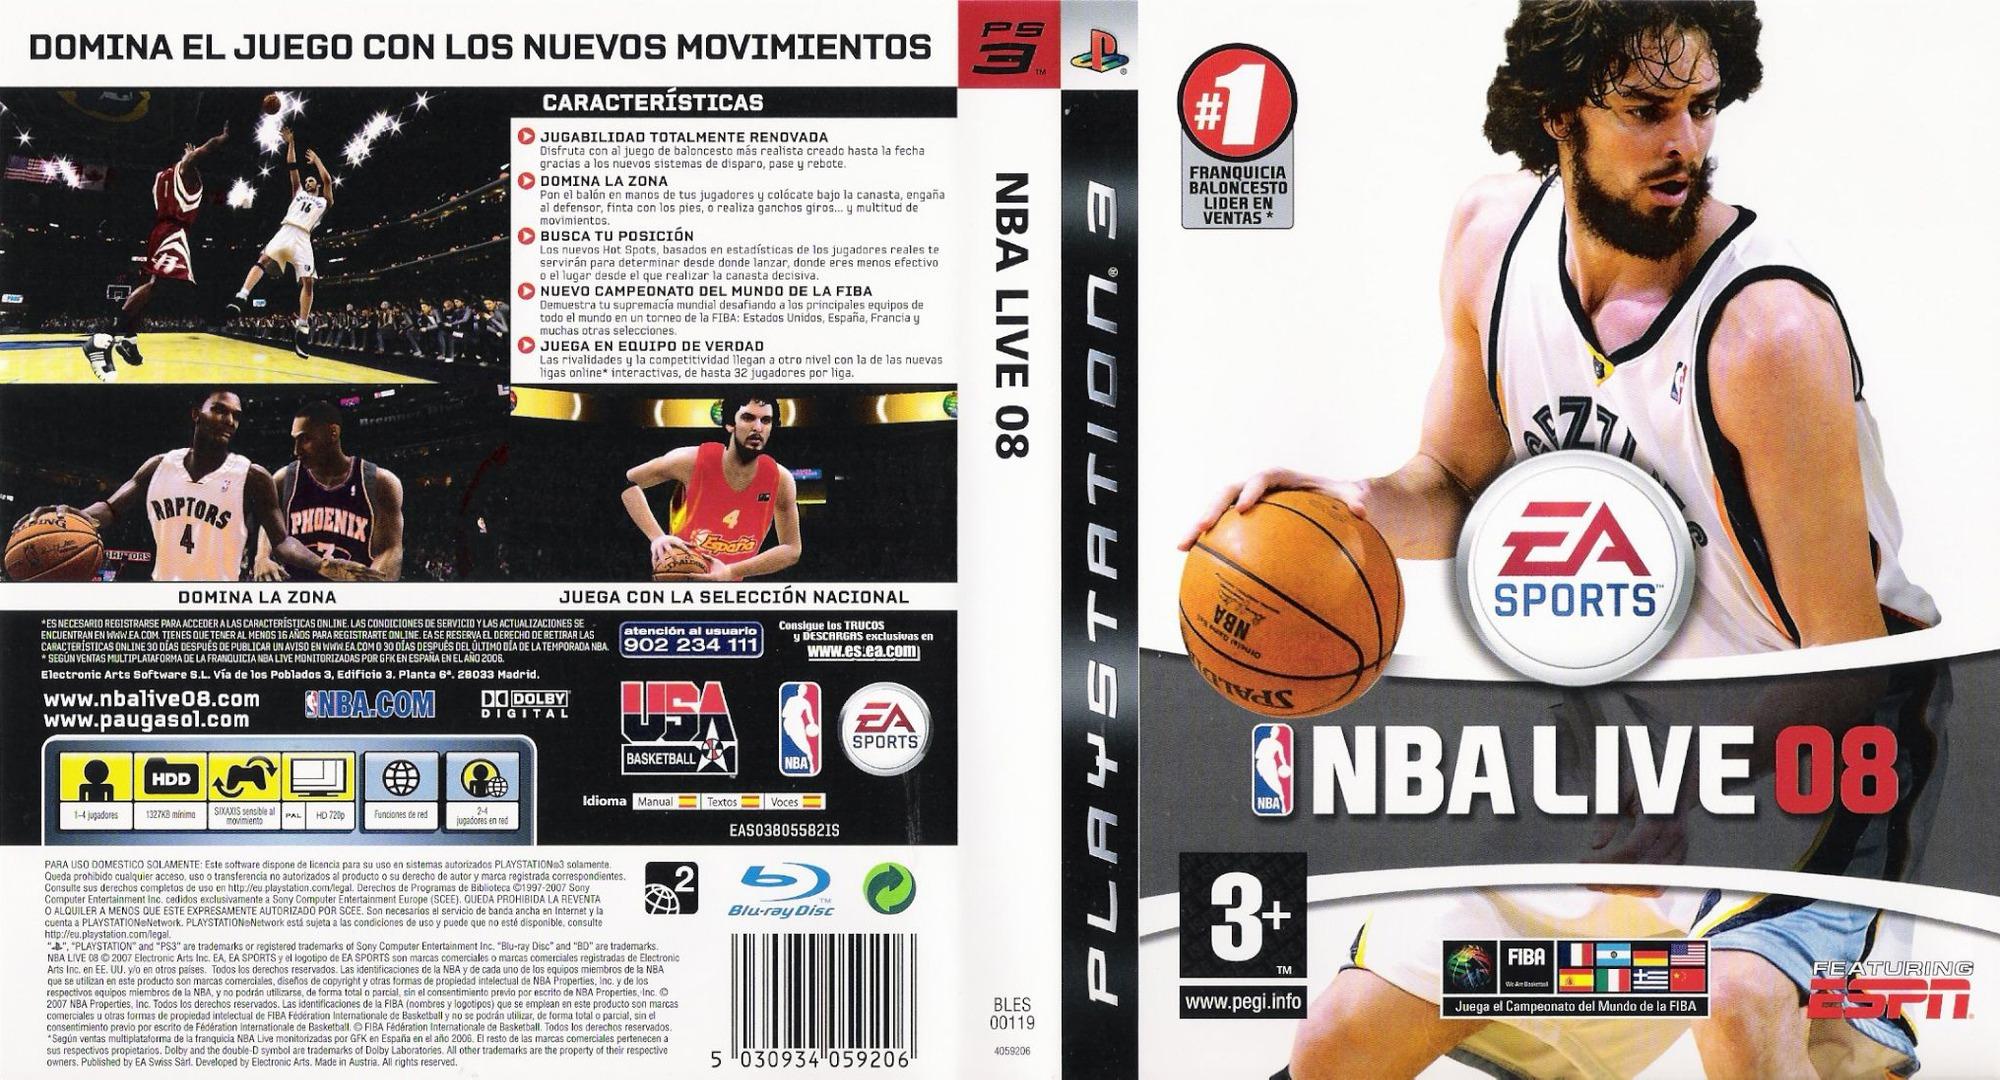 BLES00119 - NBA Live 08